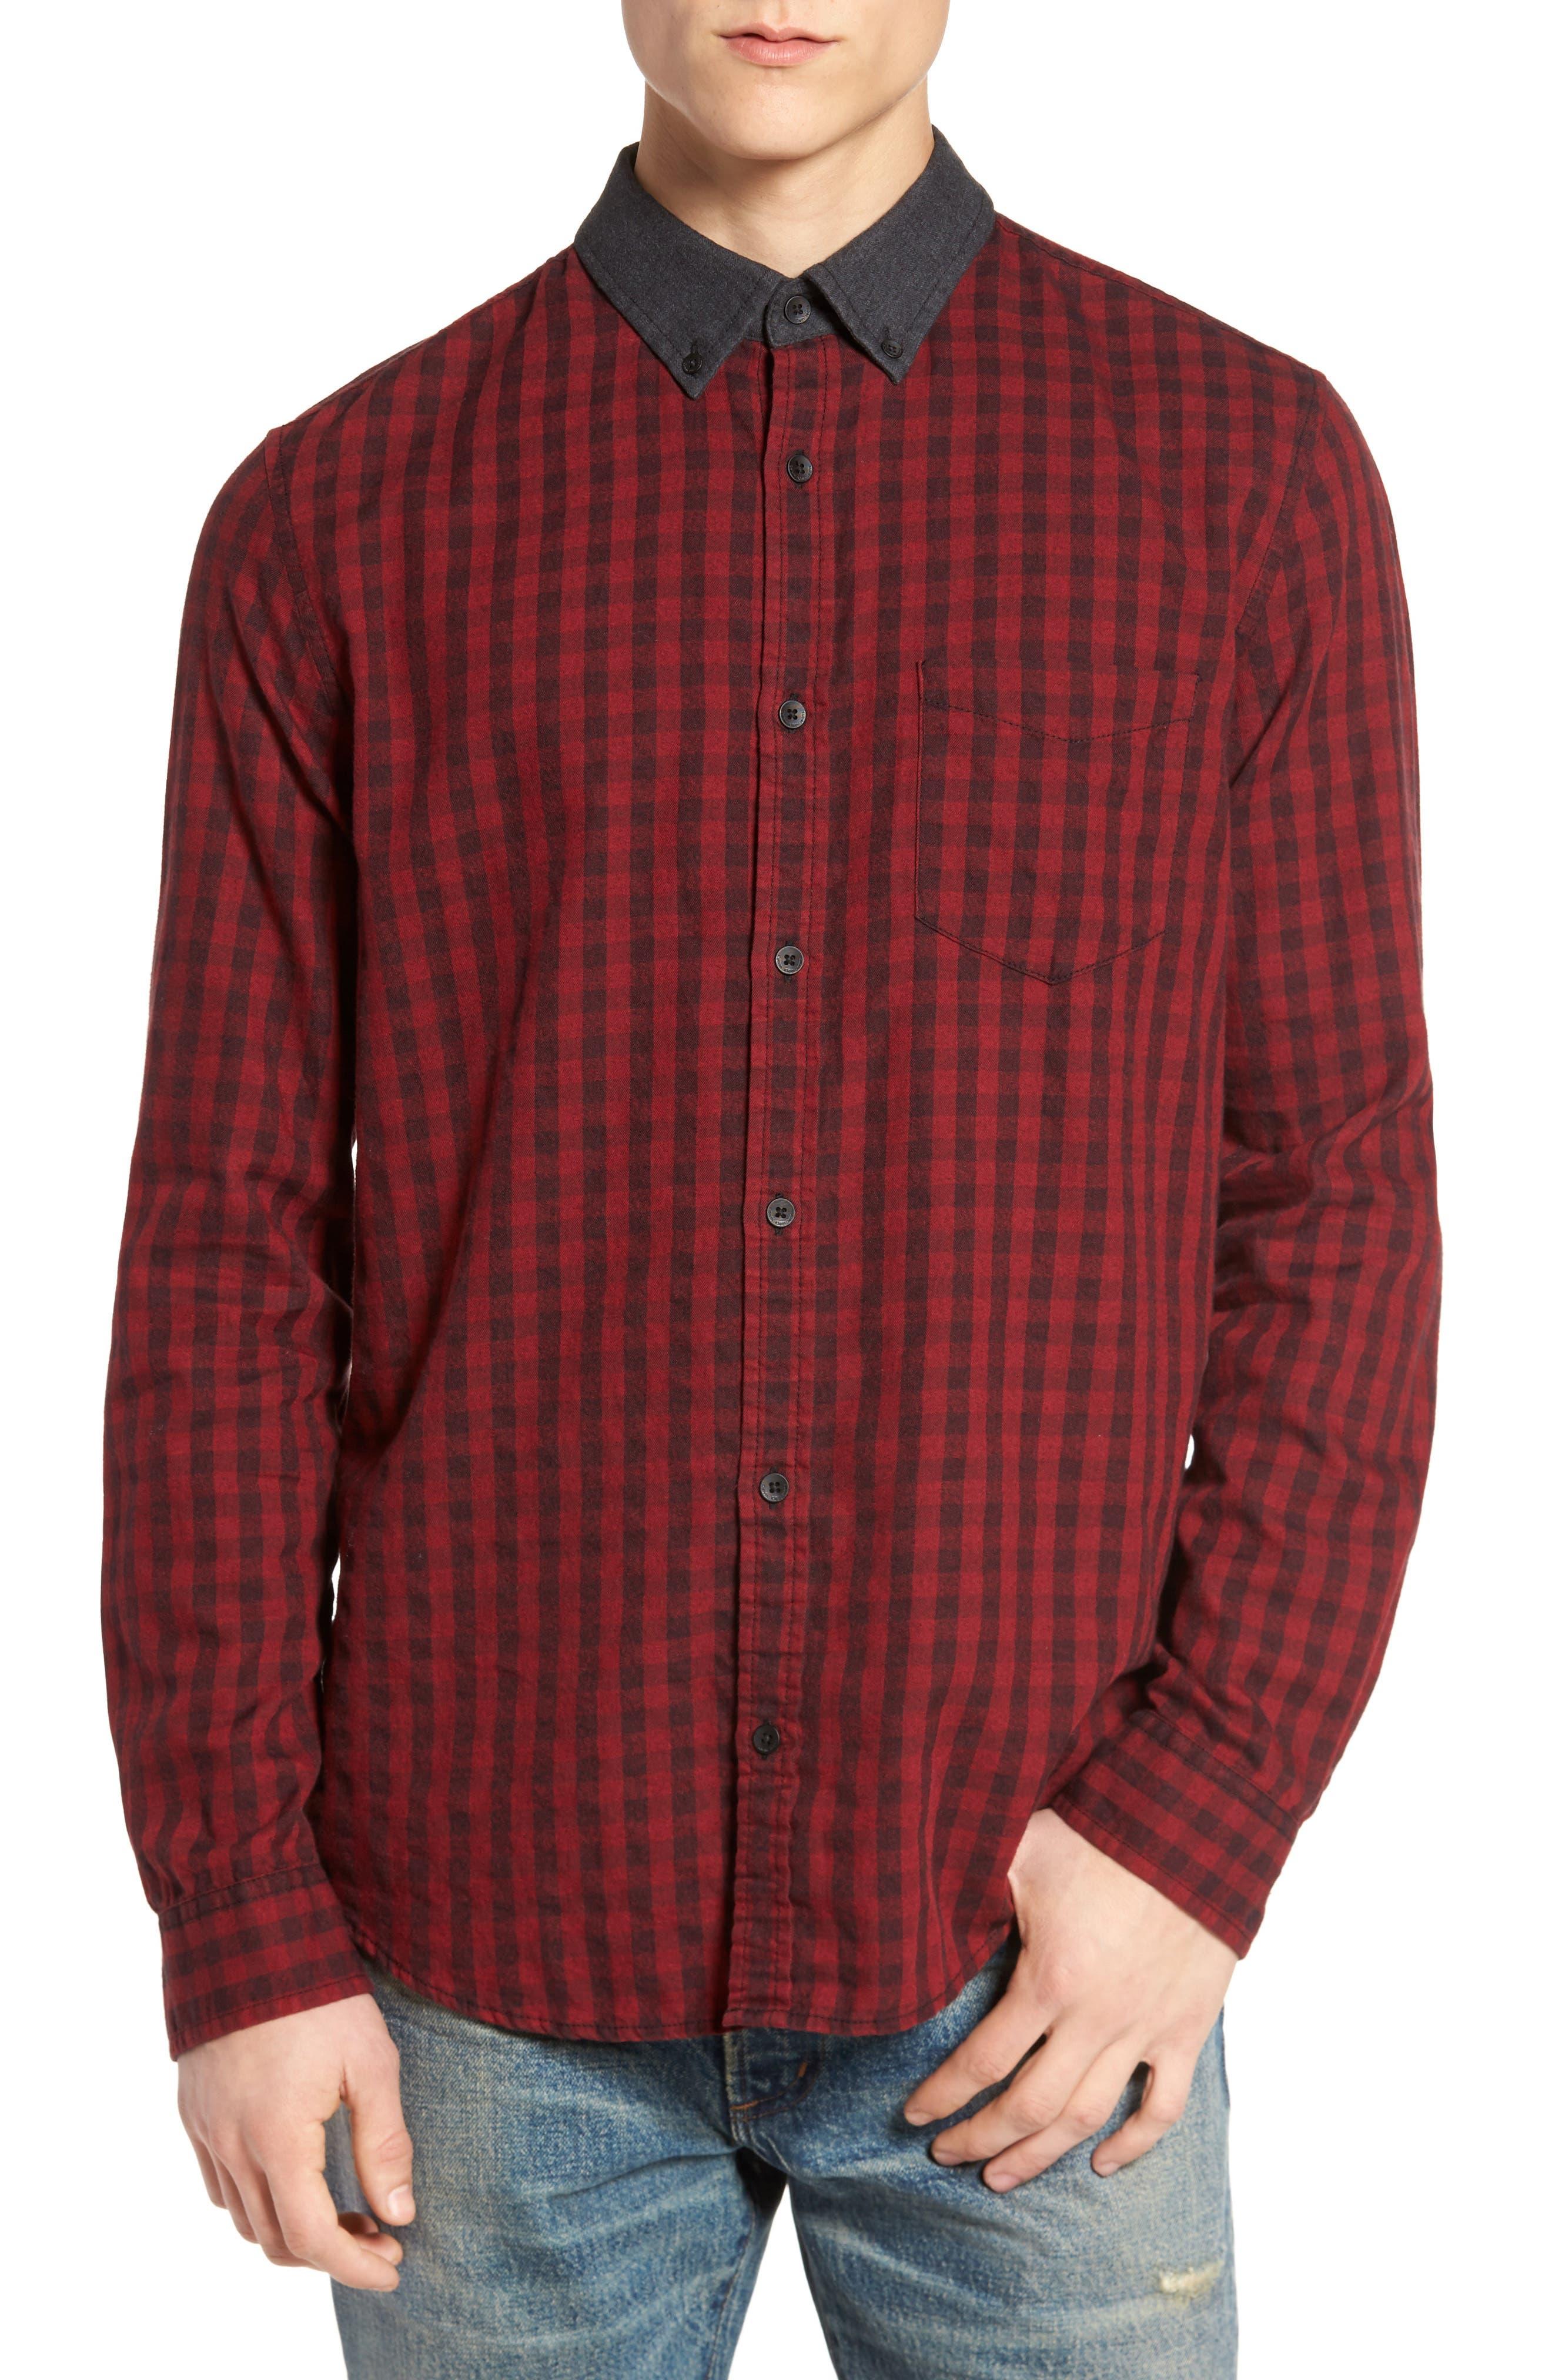 Alternate Image 1 Selected - Calvin Klein Jeans Barn Flannel Shirt